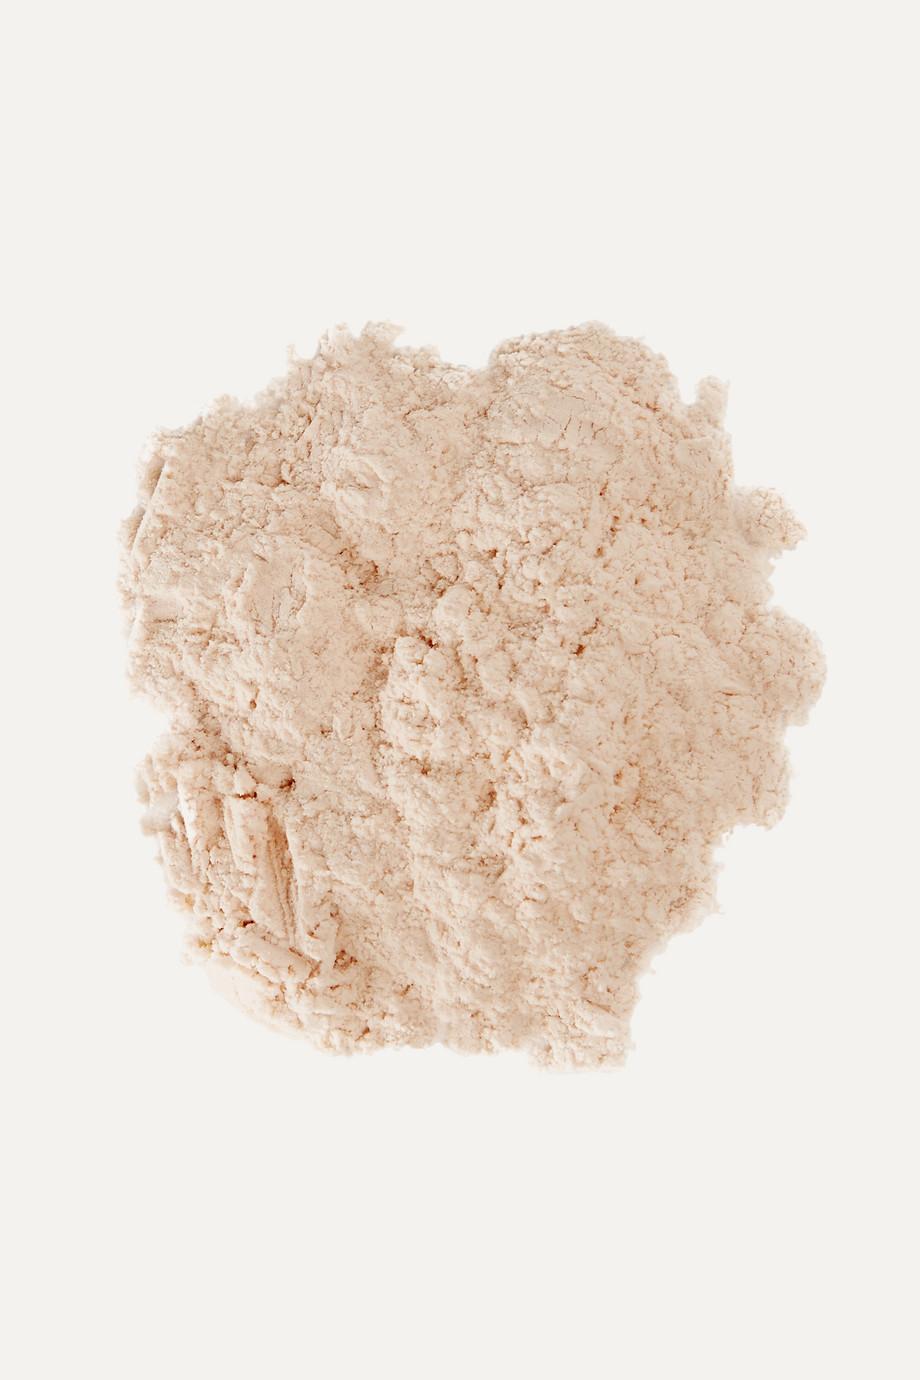 Huda Beauty Easy Bake Loose Powder - Pound Cake